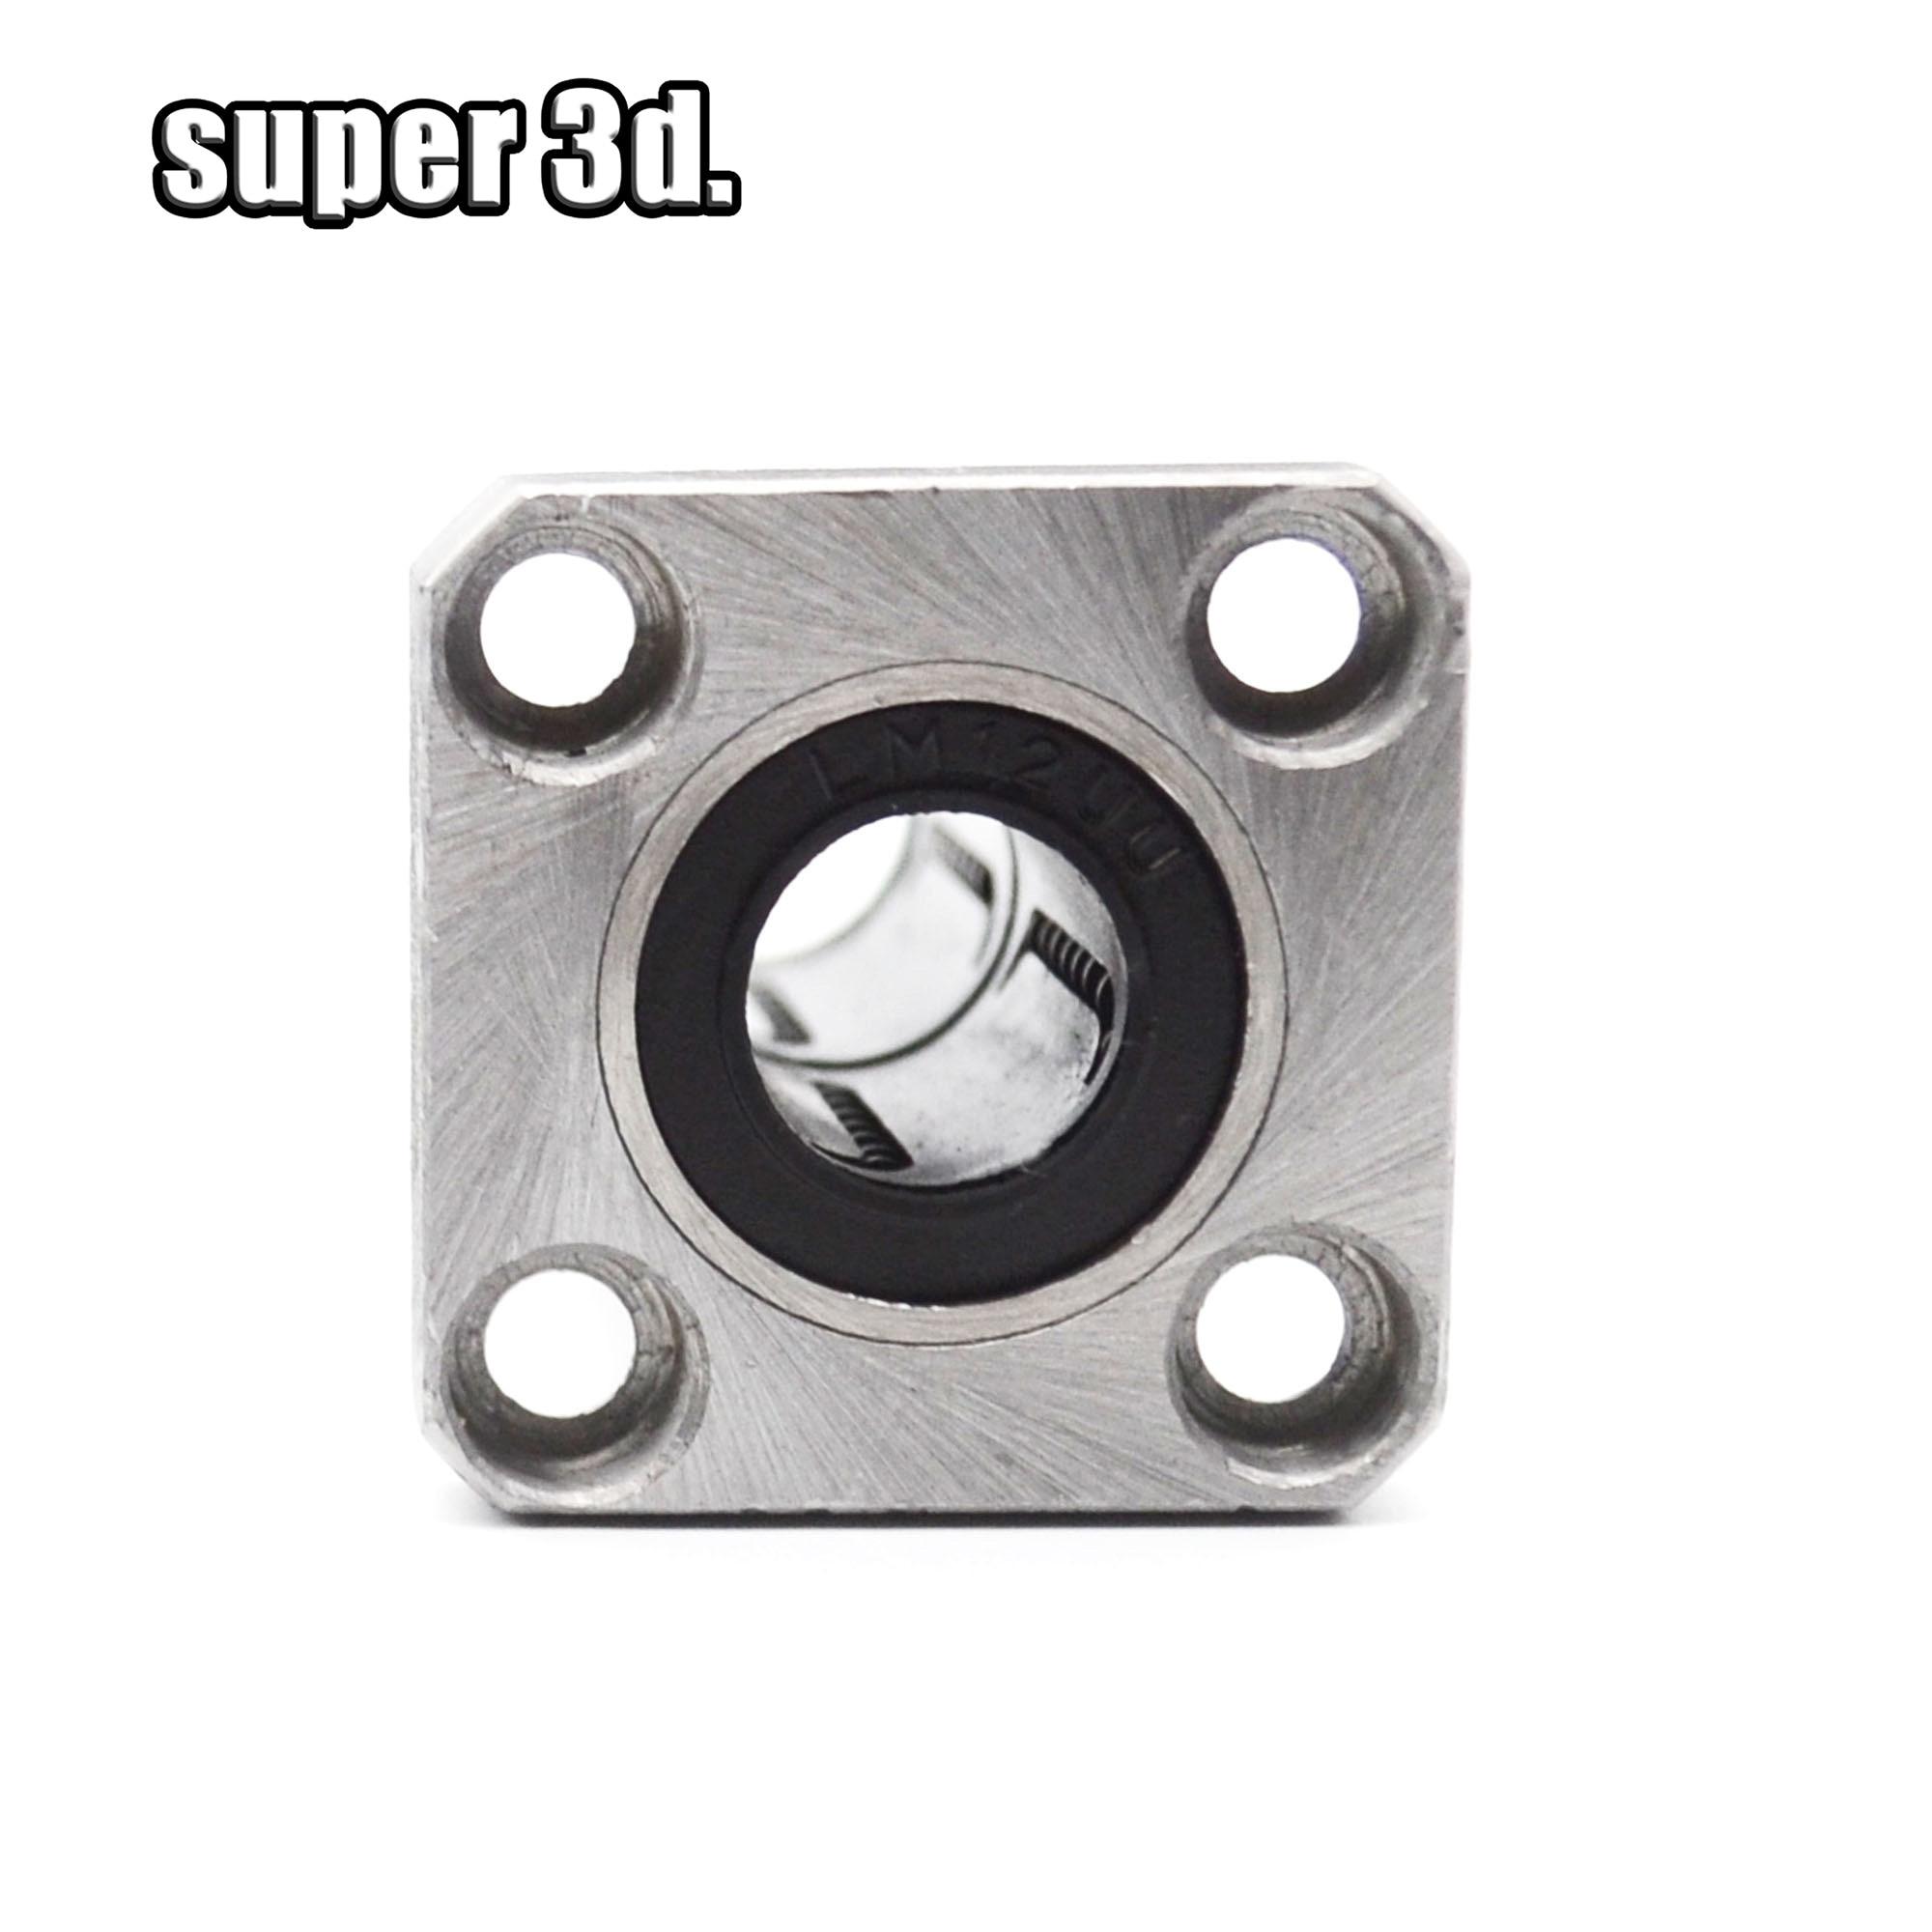 1Pcs LMK8LUU 8mm Long Square Flange Type Linear Motion Ball Bearing Bushing !